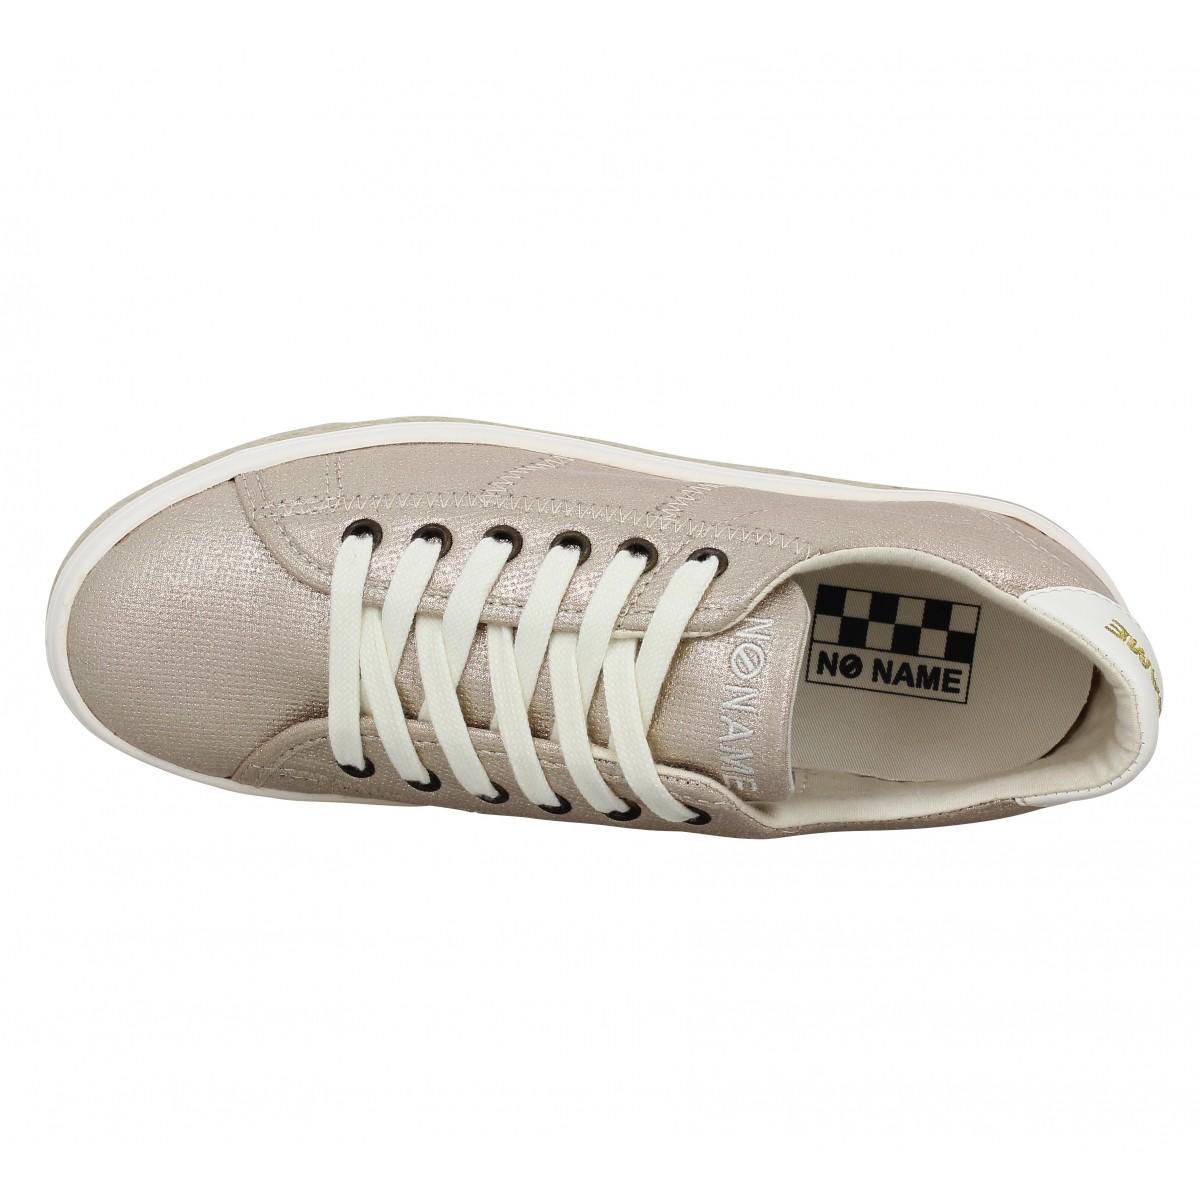 no name malibu sneaker toile femme or femme fanny chaussures. Black Bedroom Furniture Sets. Home Design Ideas